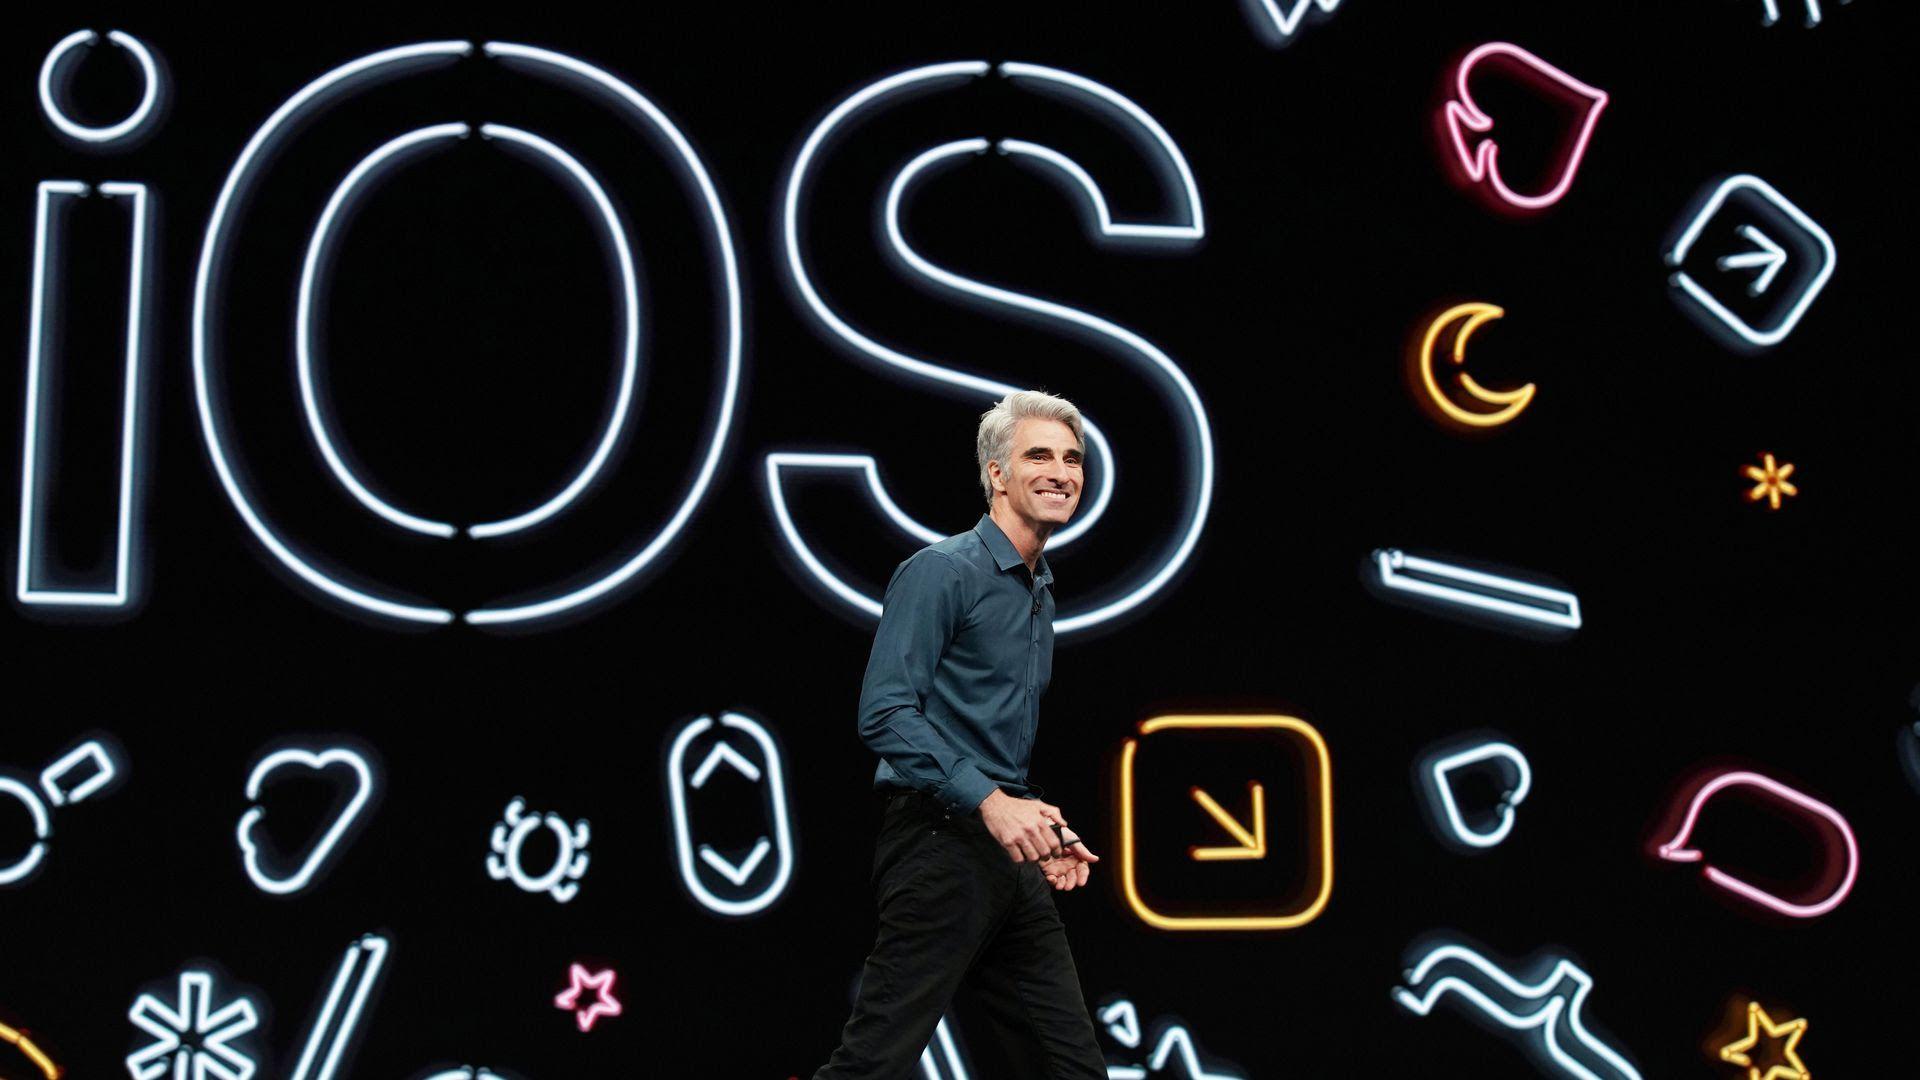 aafce248603 Craig Federighi unveiling iOS 13 at WWDC 2019. Photo: Apple